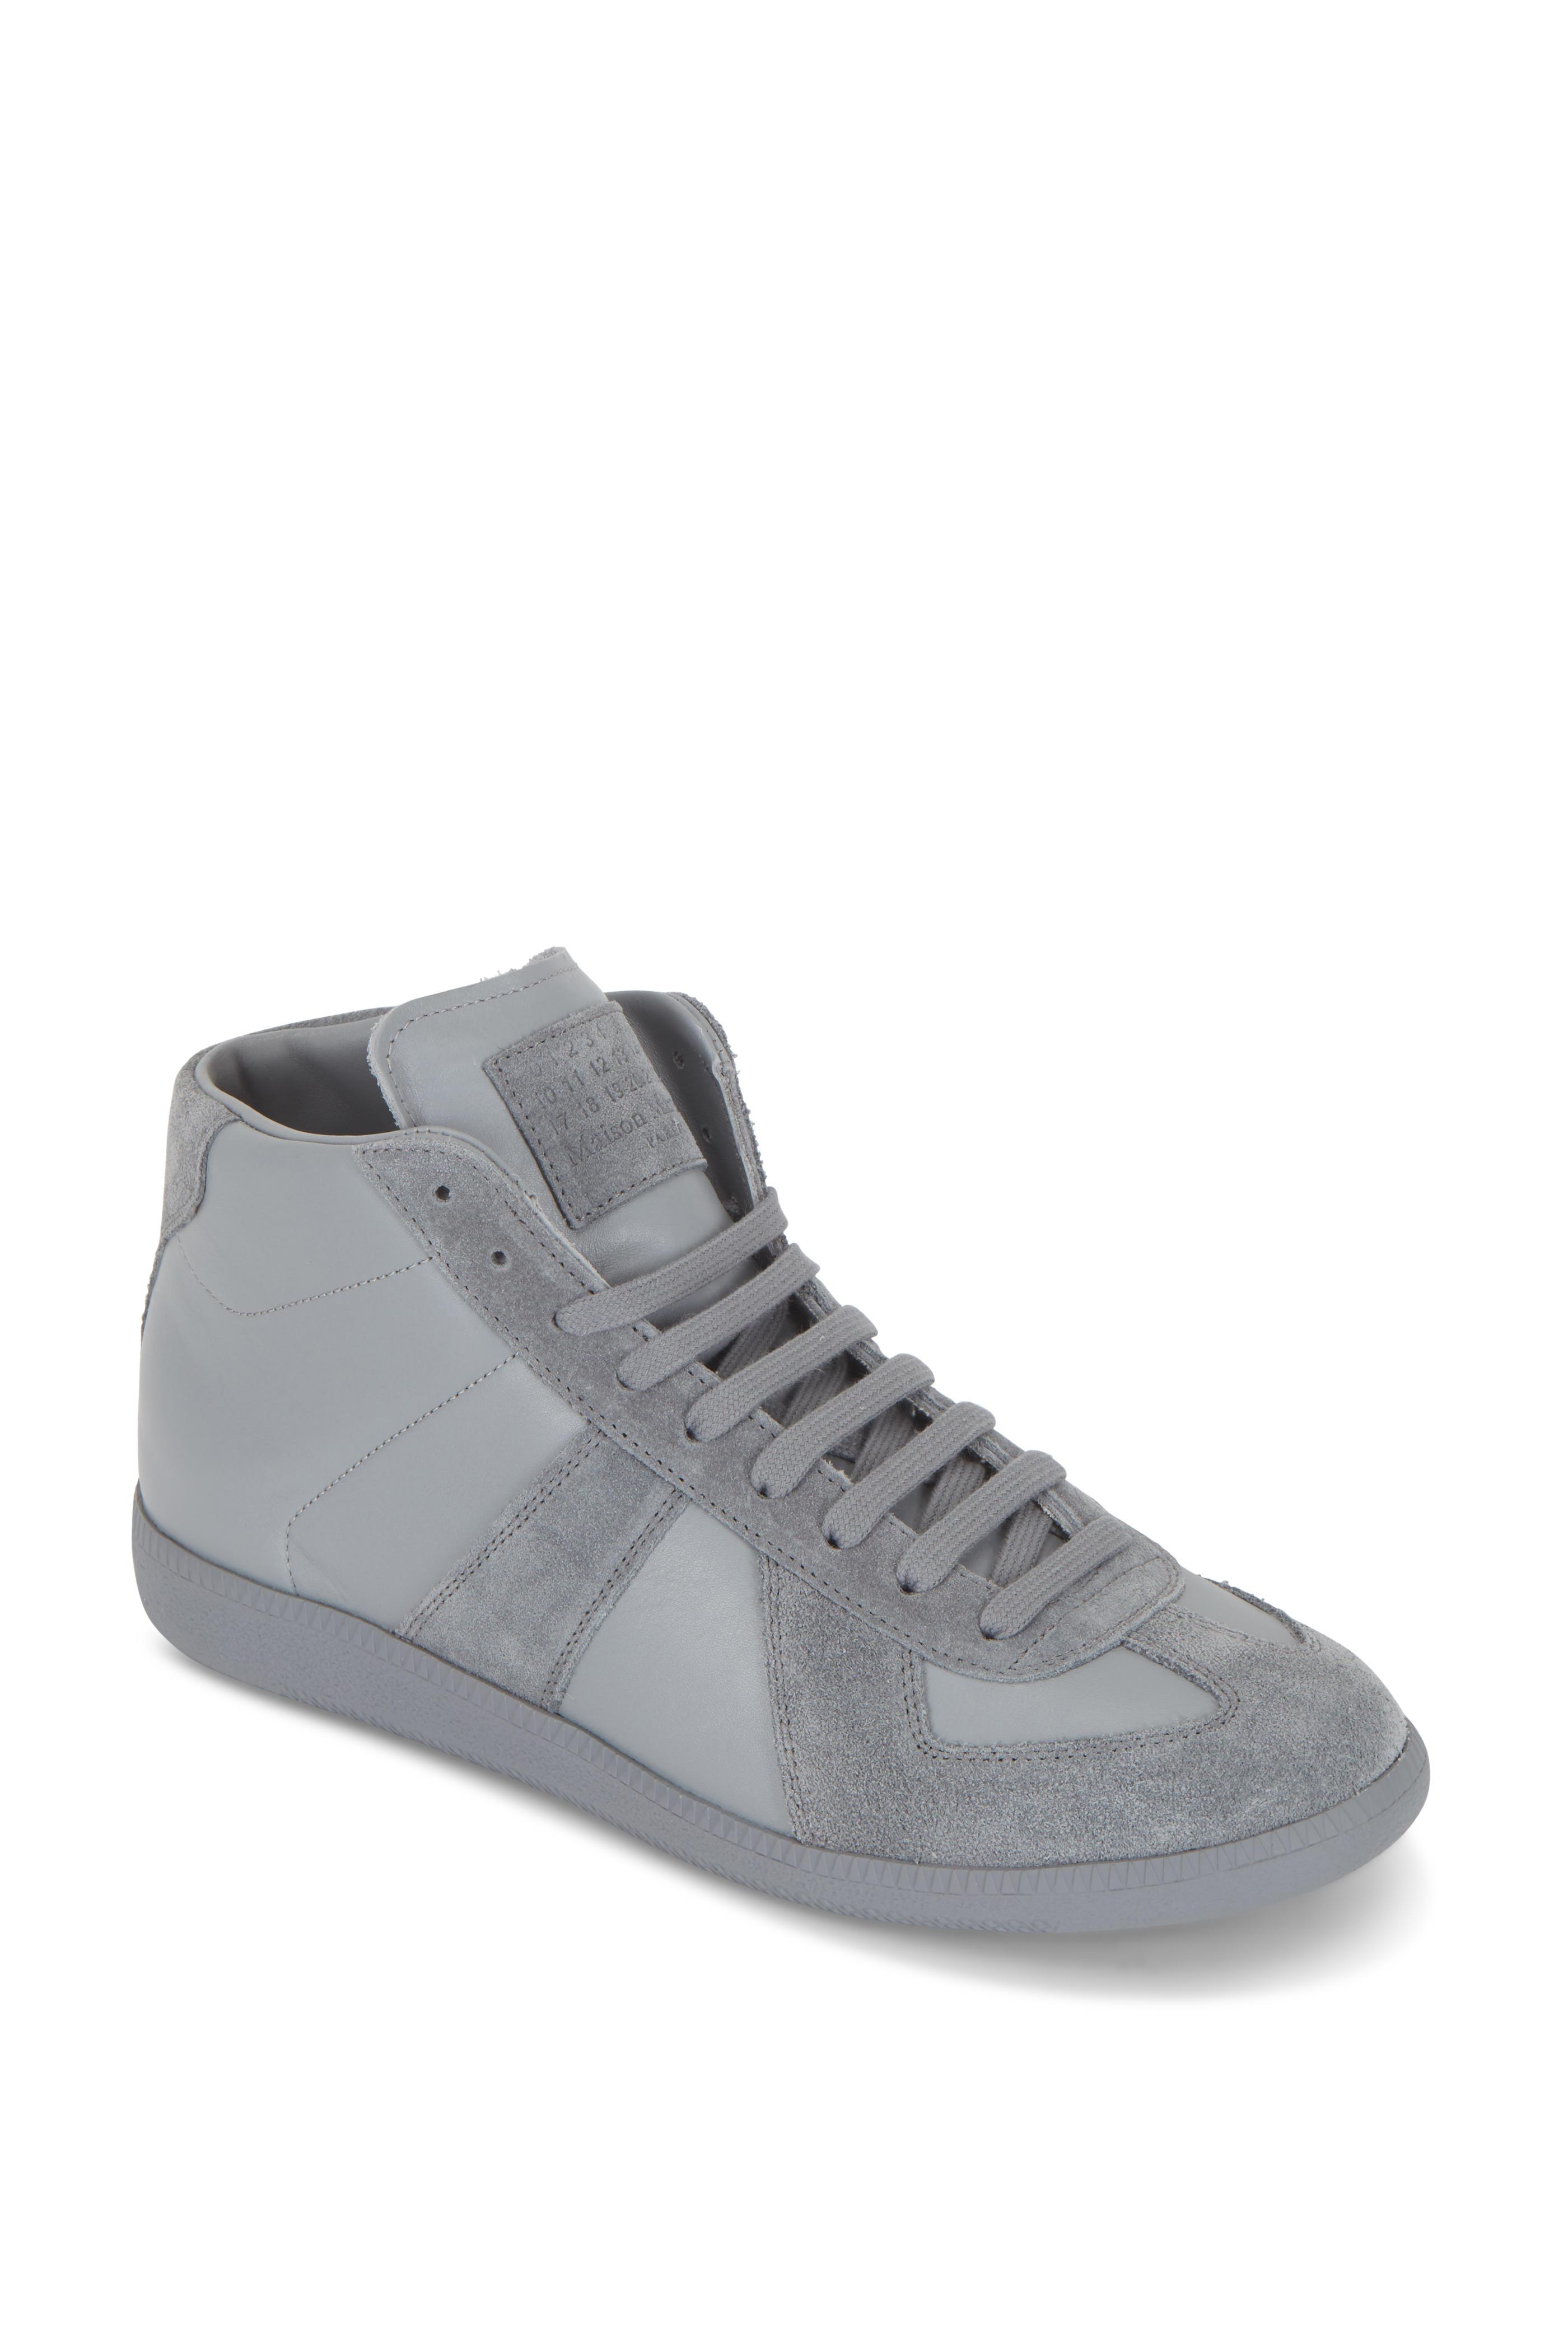 4f18074f73b Maison Margiela - Replica Gray Leather & Suede High Top Sneaker ...